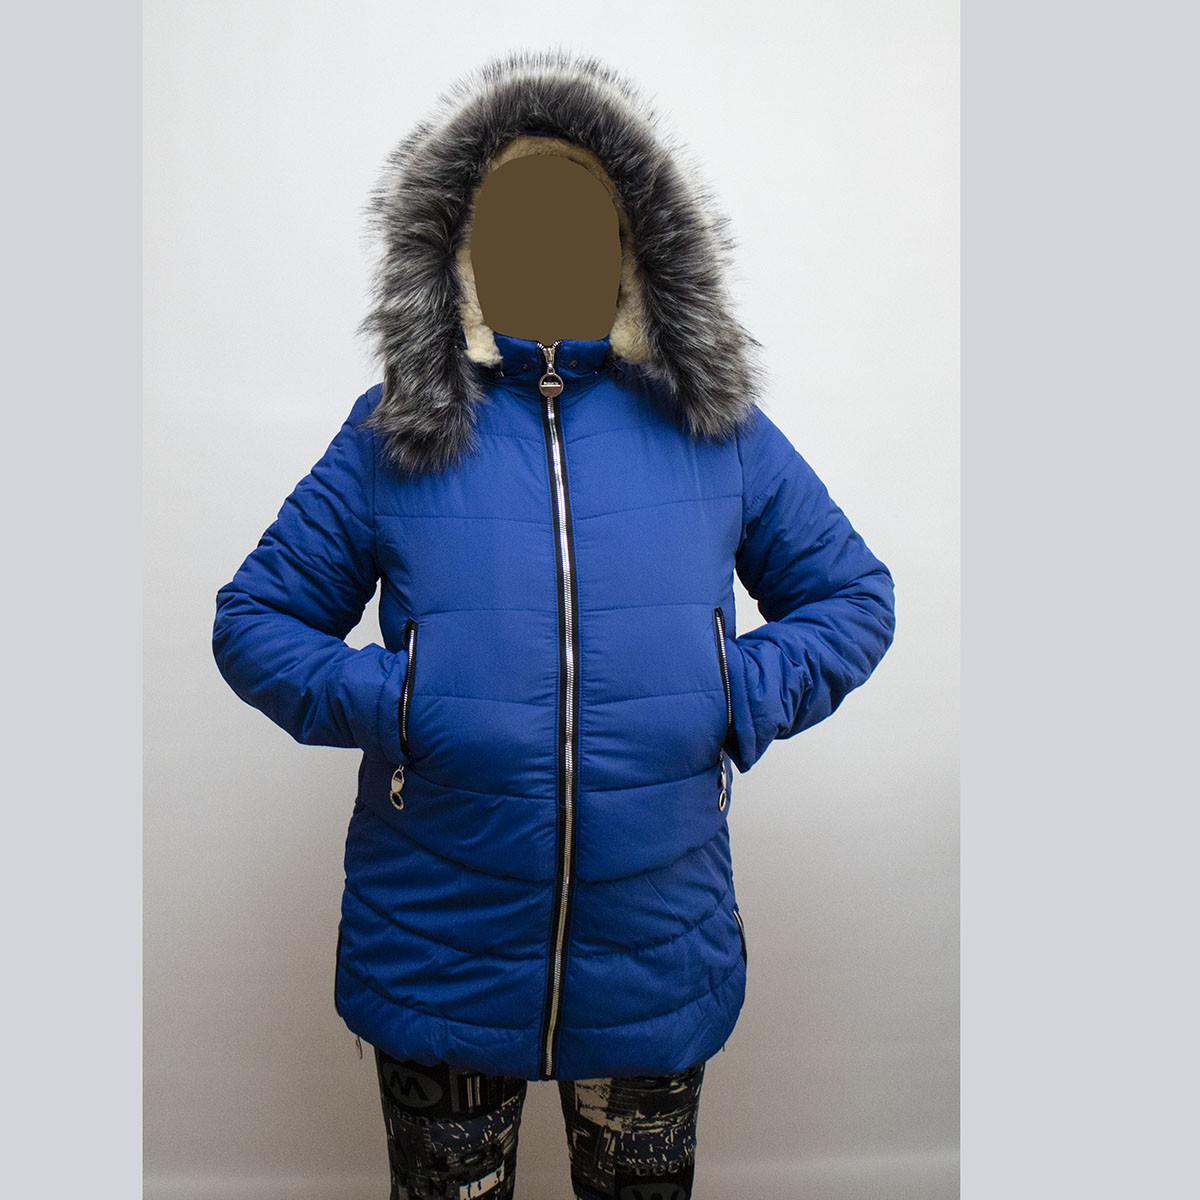 Куртка женская зимняя на овчинке по супер цене K850